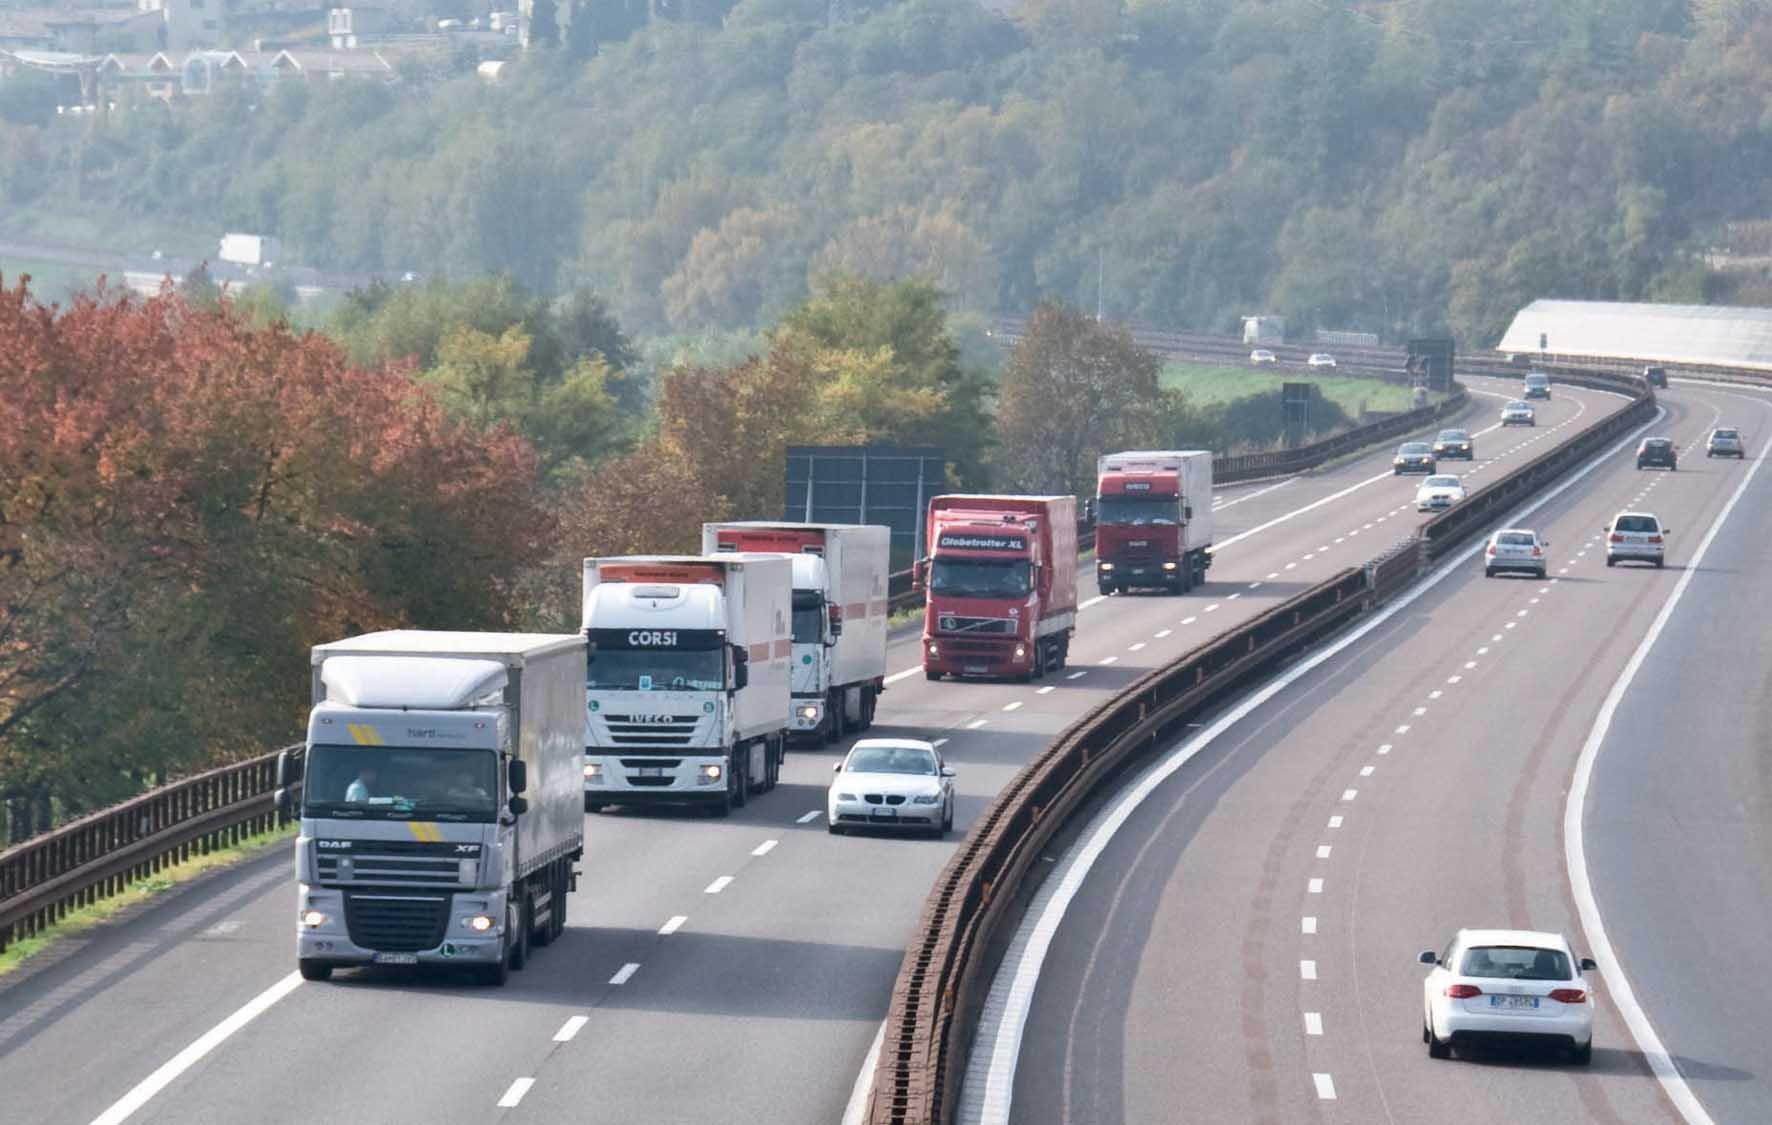 Autobrennero A22 Isera barriera antirumore fotovoltaica traffico camion 1